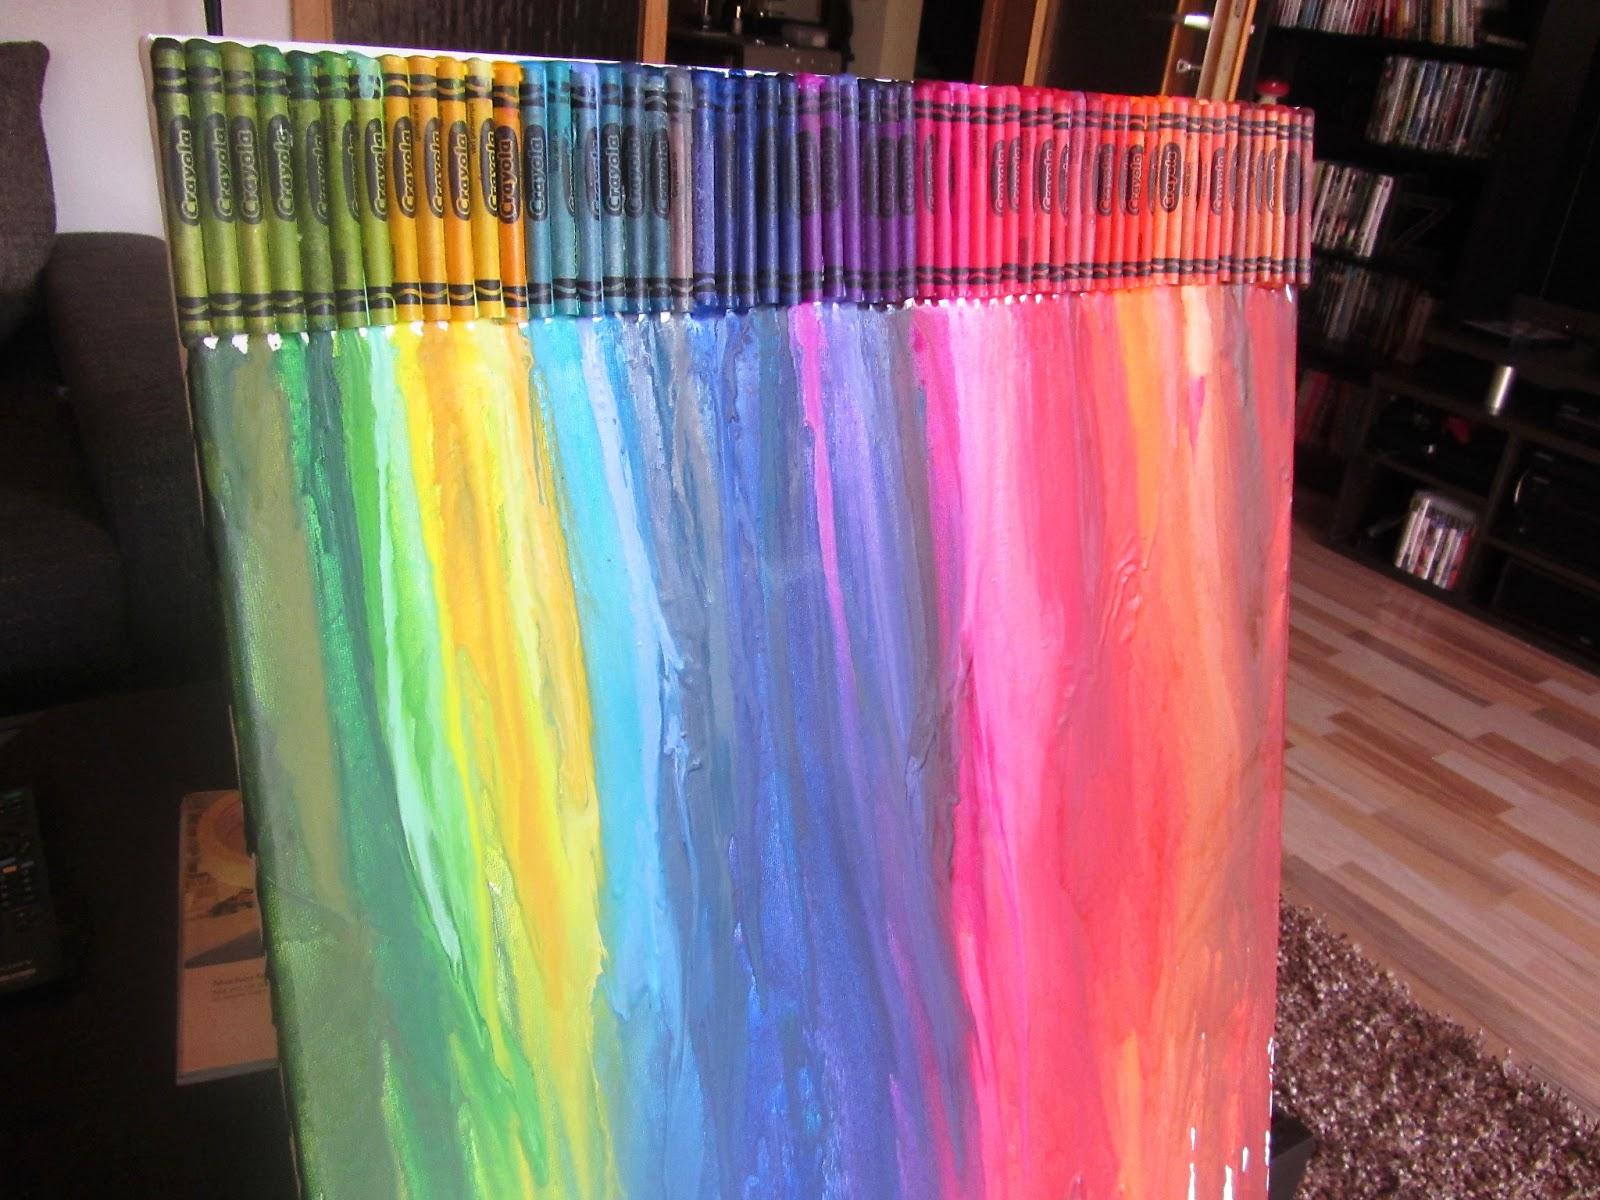 Kreativ Oder Primitiv Crayon Art Pärchen Im Regen